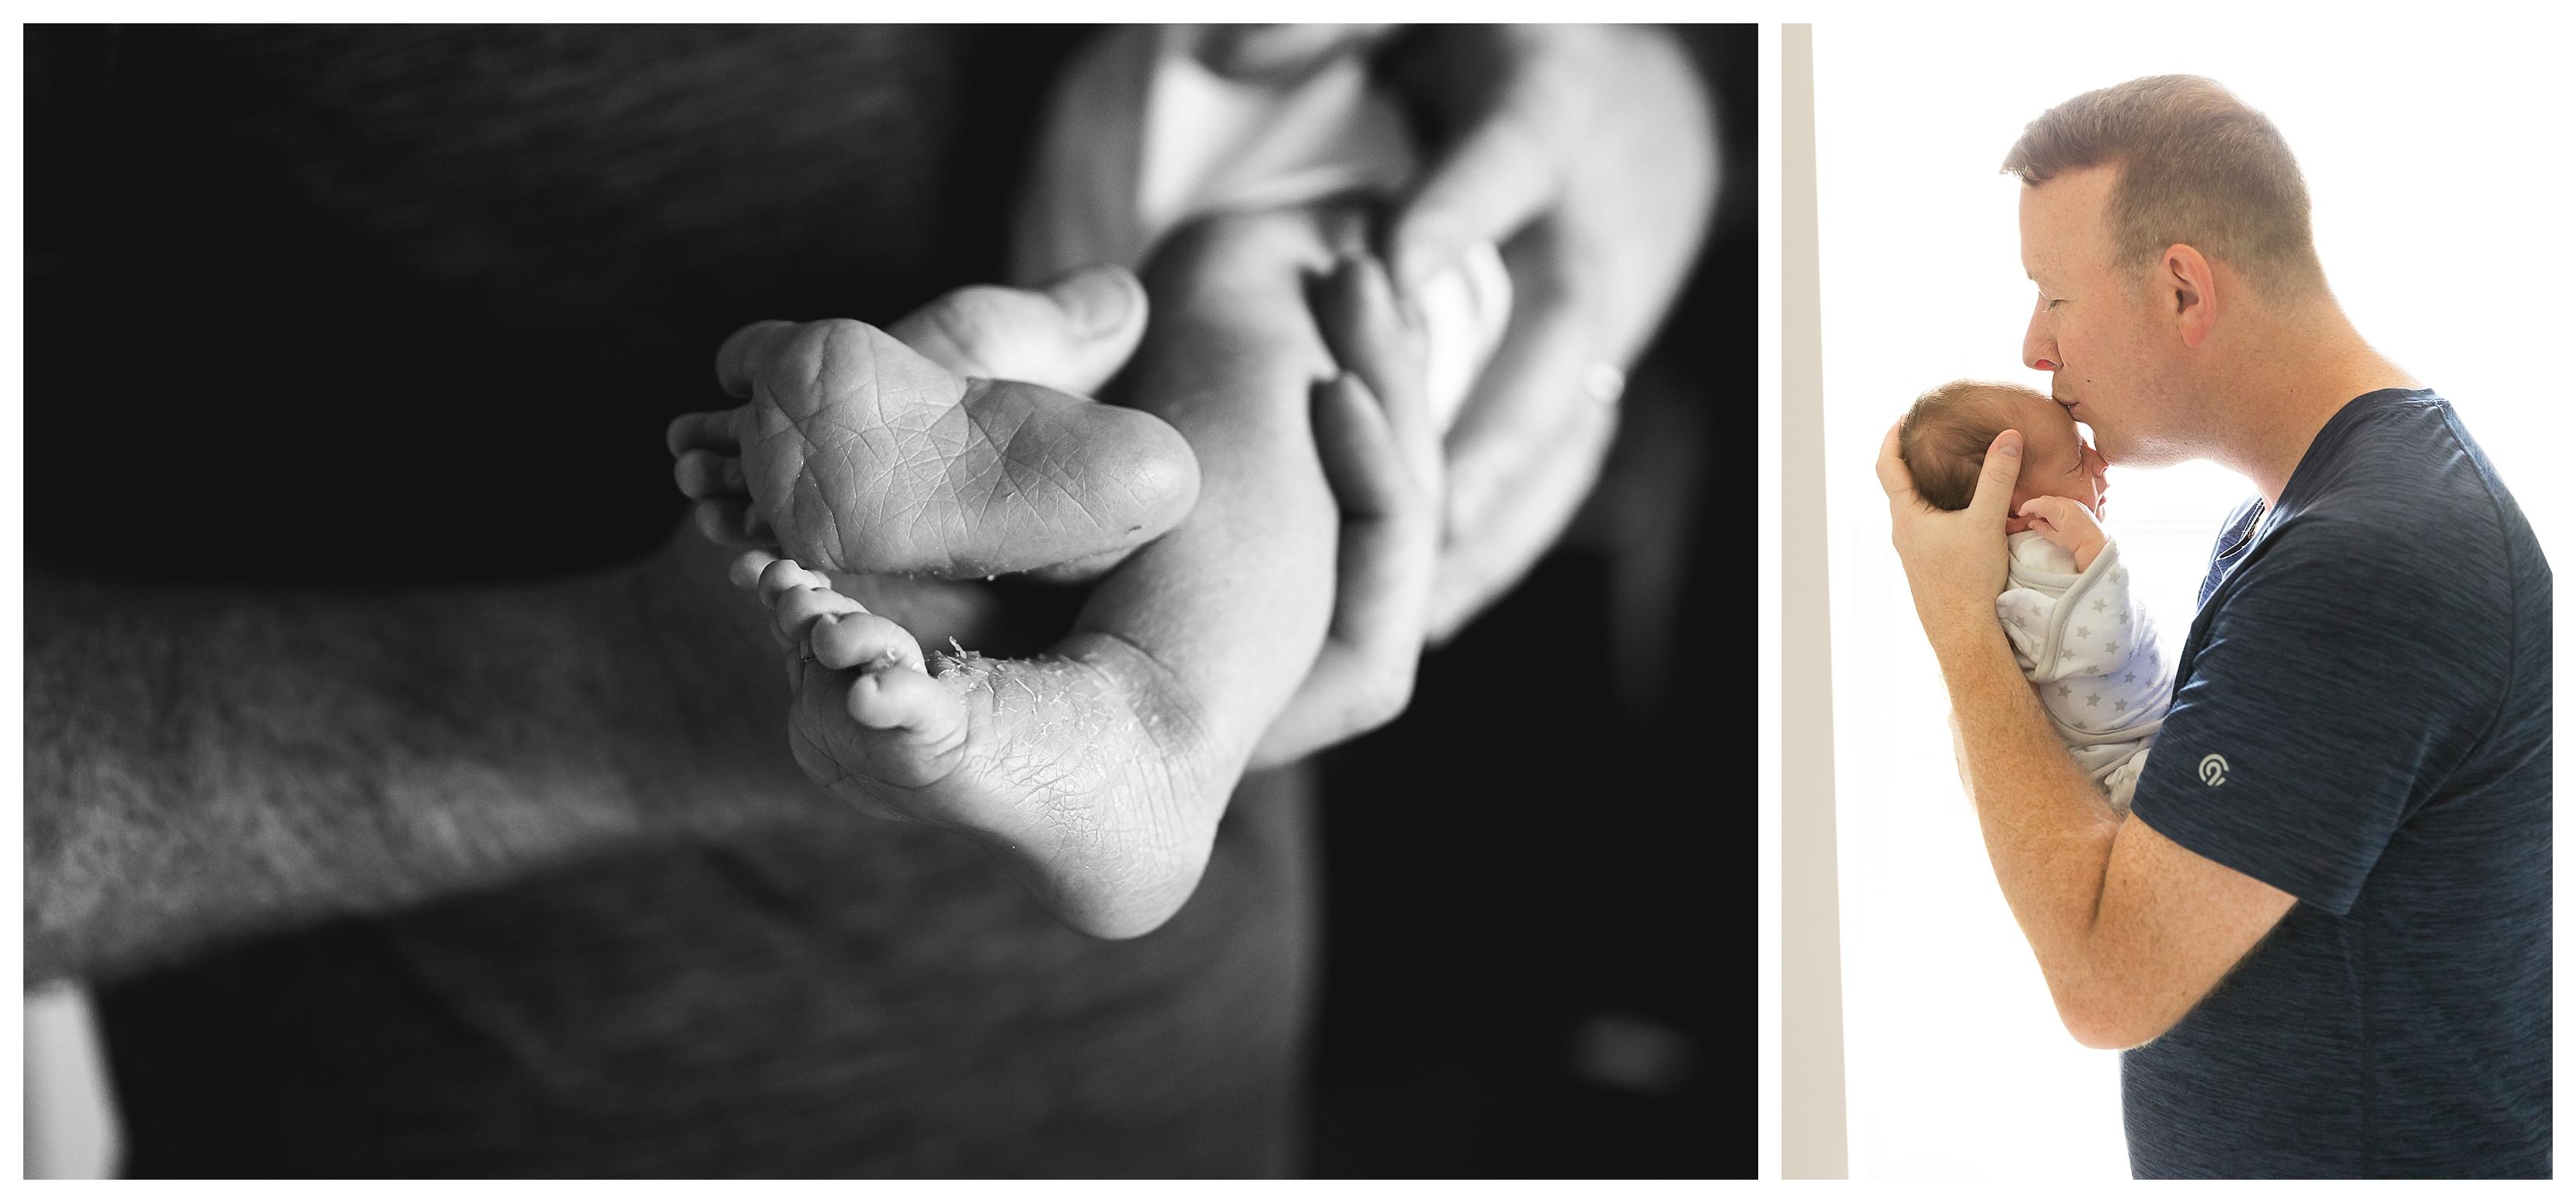 Ypsilanti Baby Photographer | And Baby Makes Three